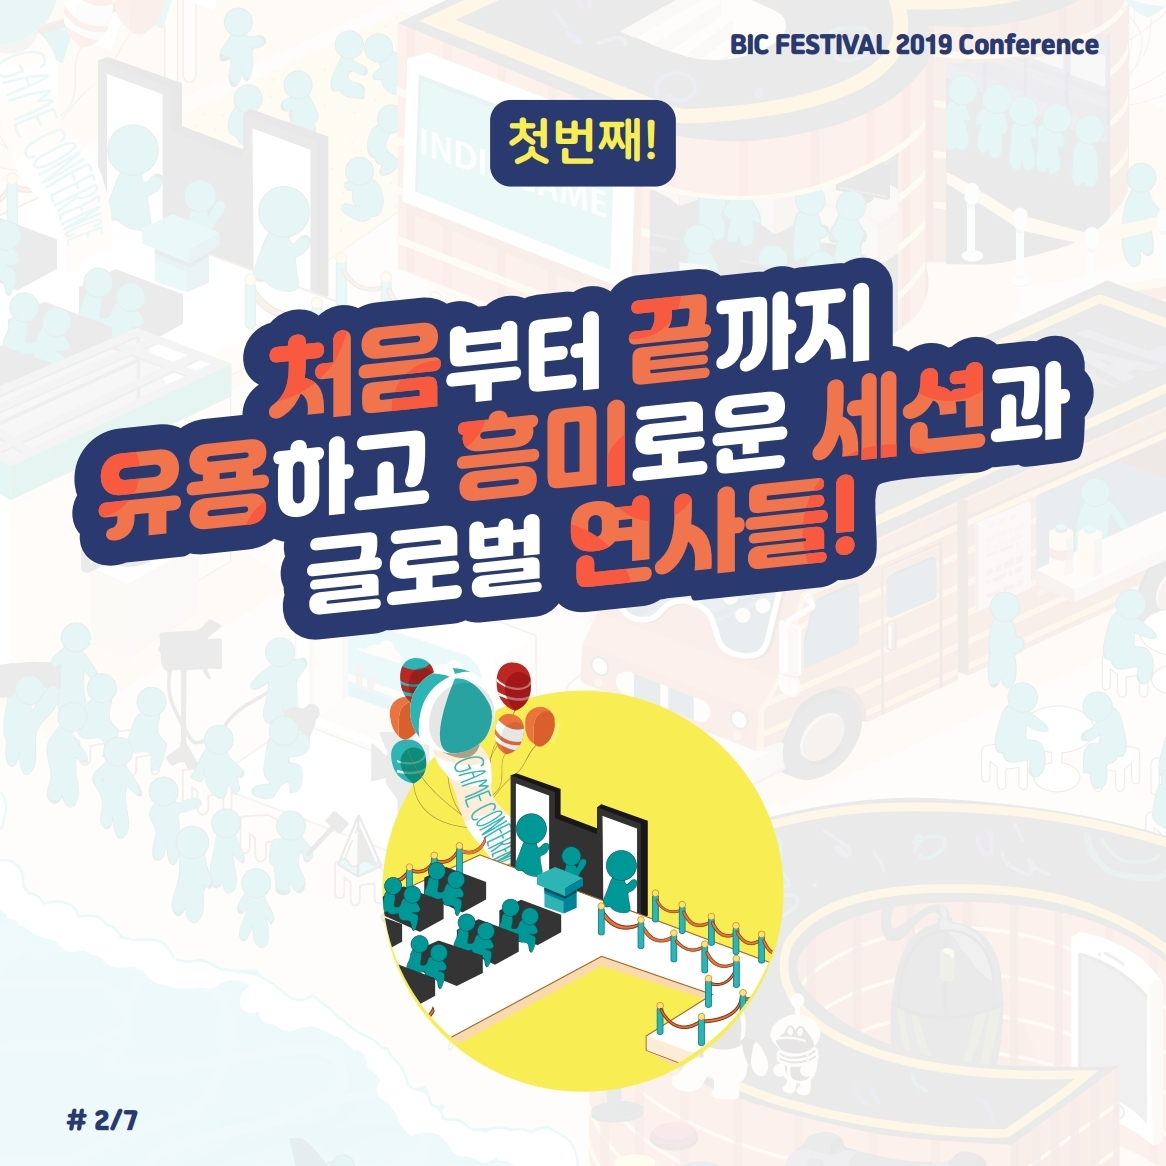 BIC_cardnews_01_Conference_02.jpg